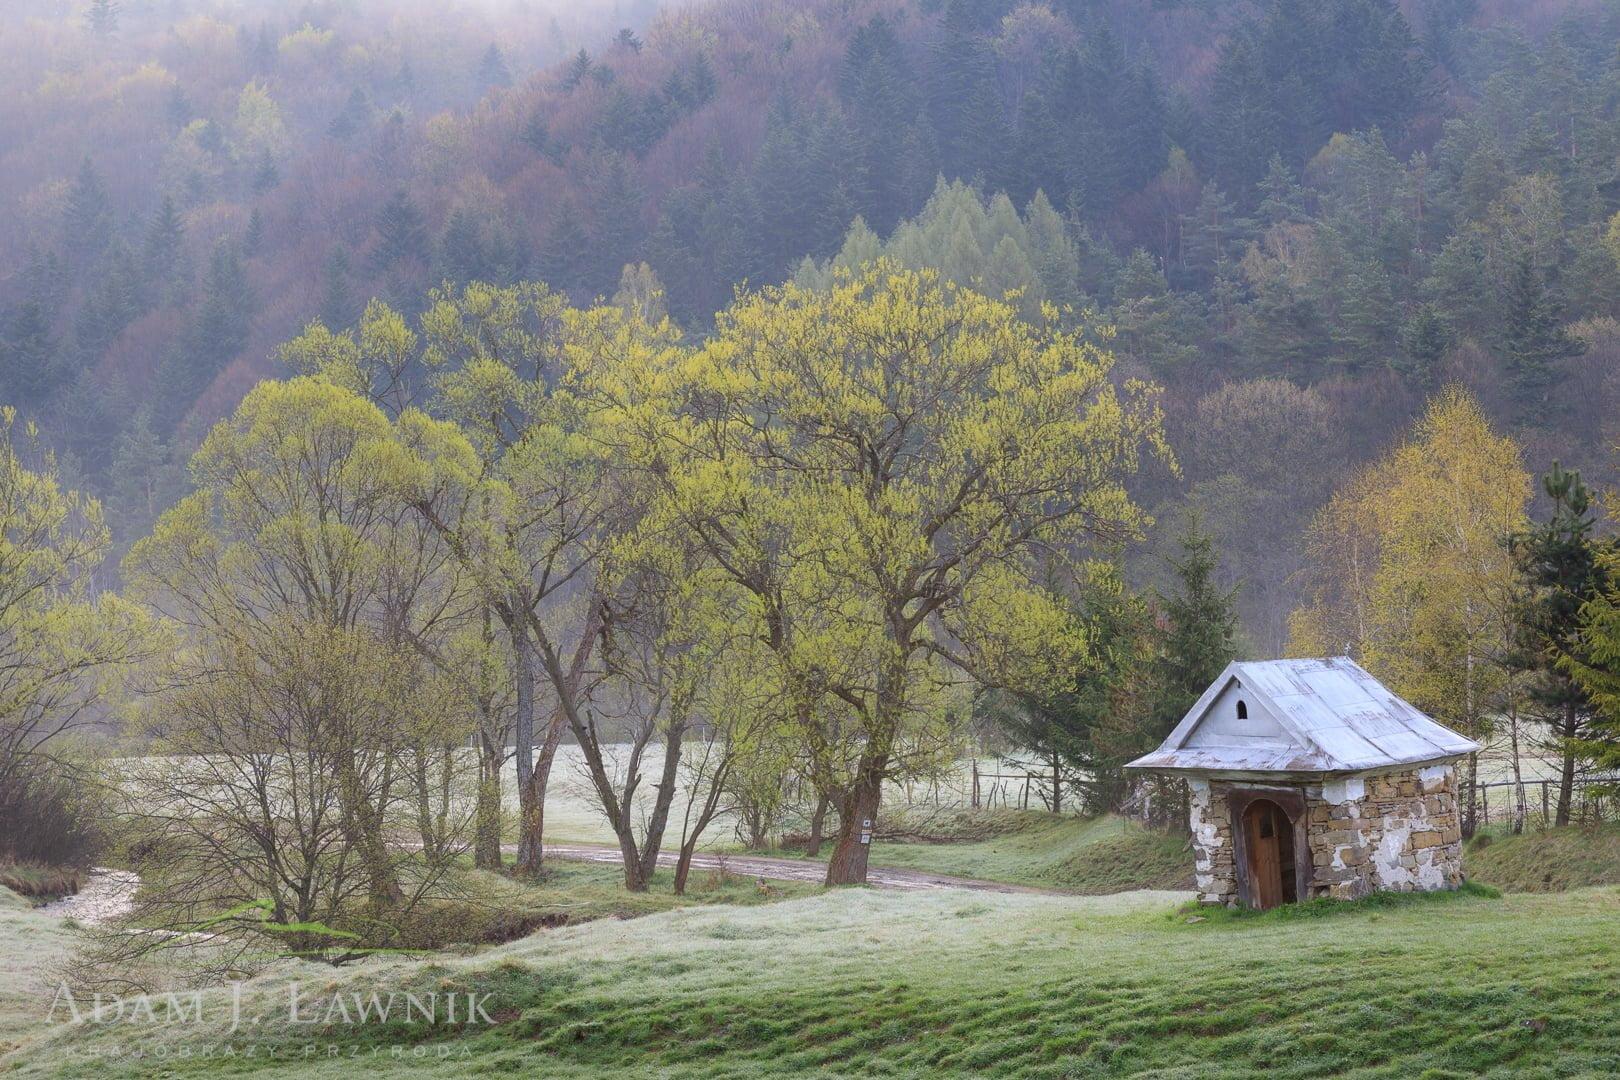 Kapliczka we wsi Czarne, Beskid Niski